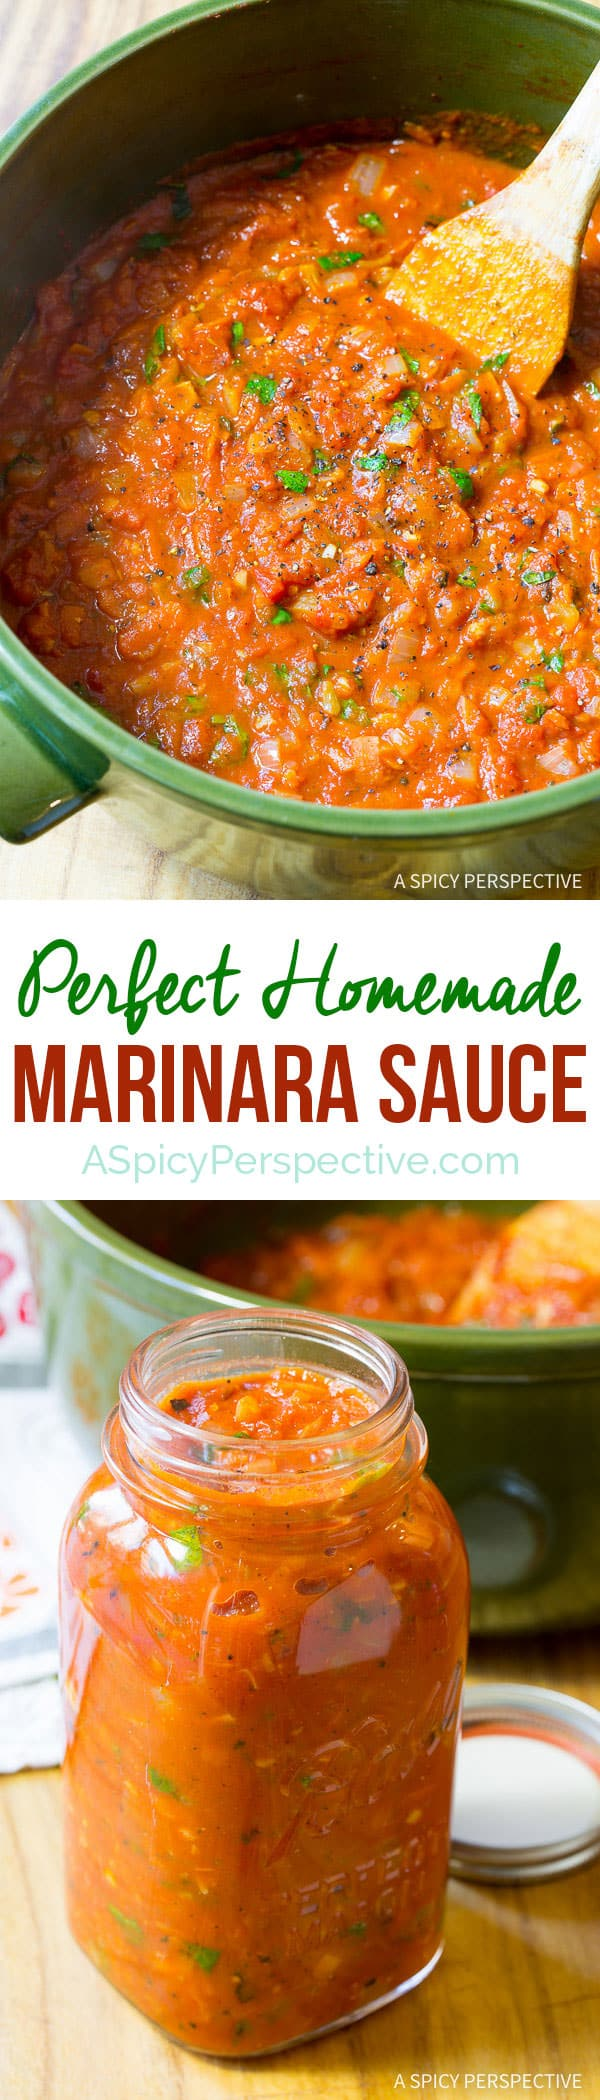 How to Make Marinara Sauce (with Recipe)   ASpicyPerspective.com